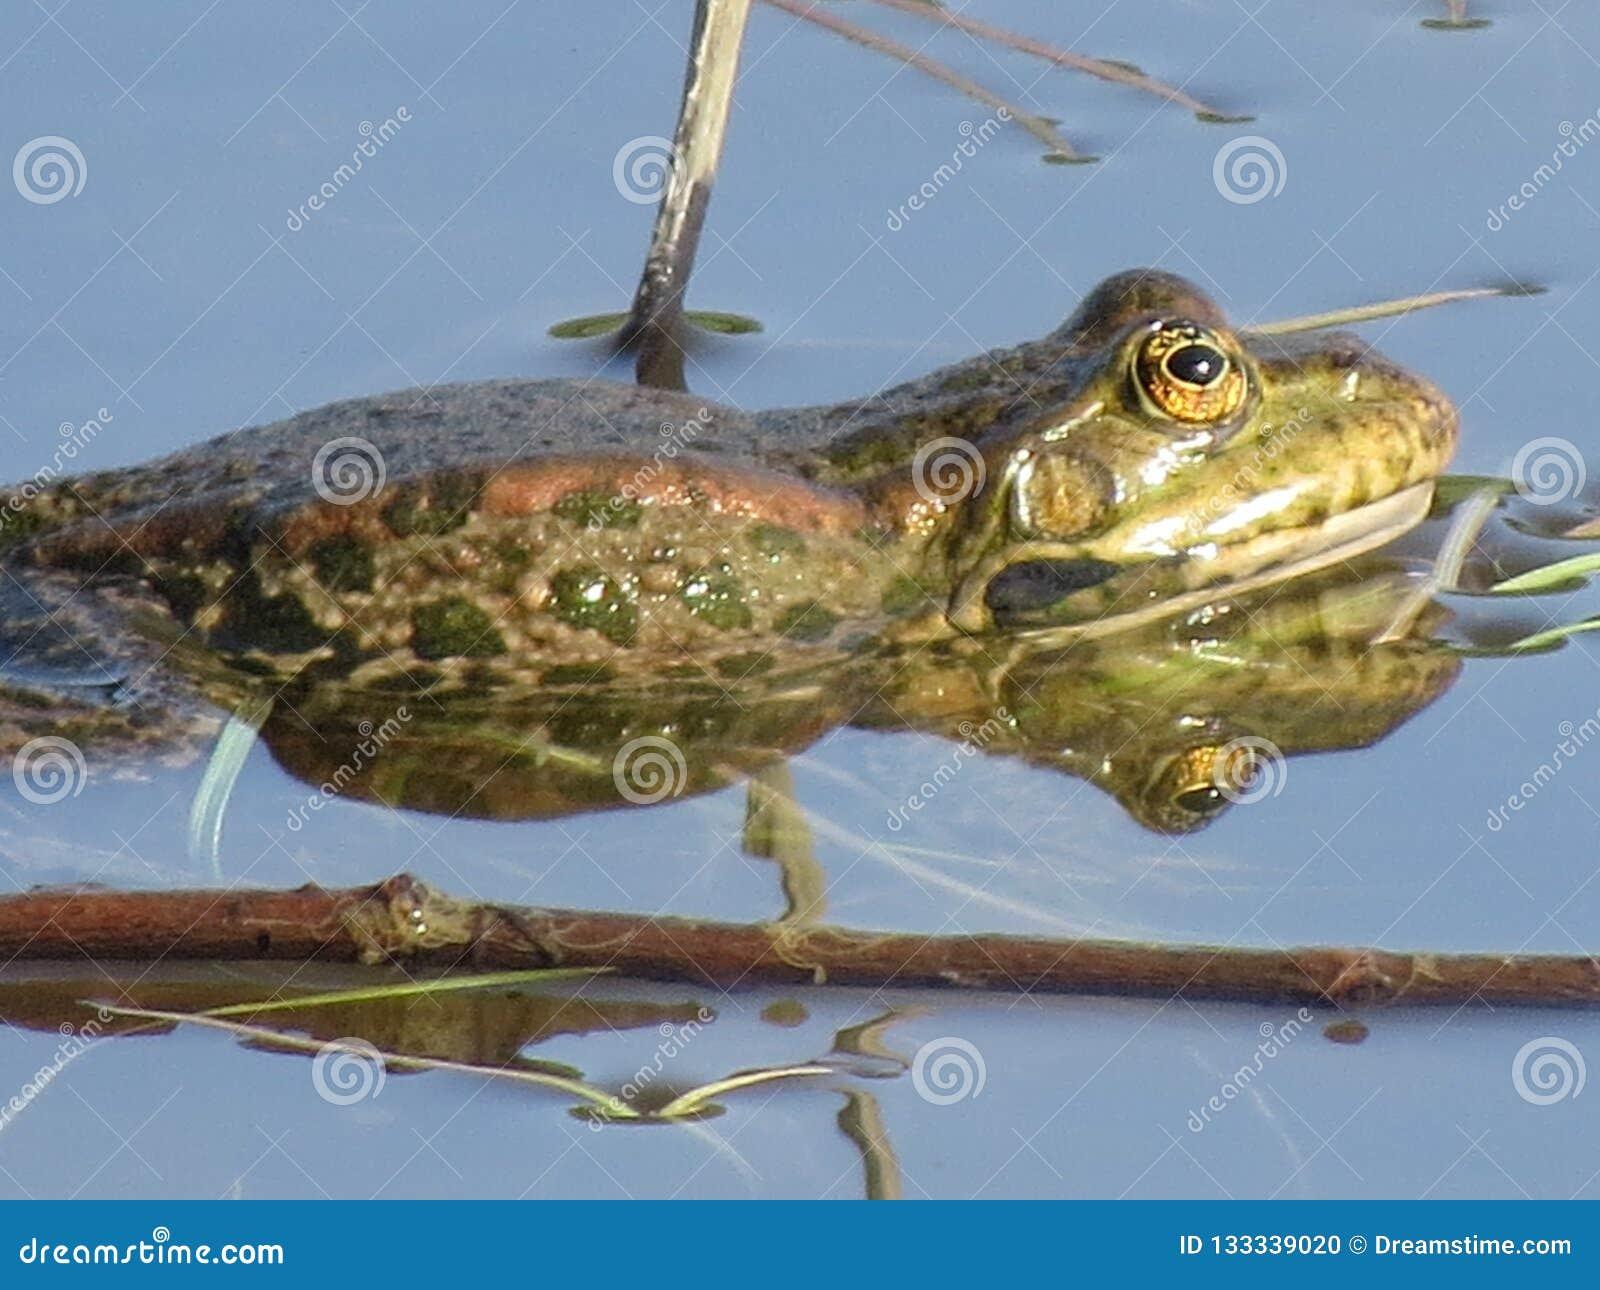 Grön groda som doppas delvist i vatten, på bakgrunden av alger